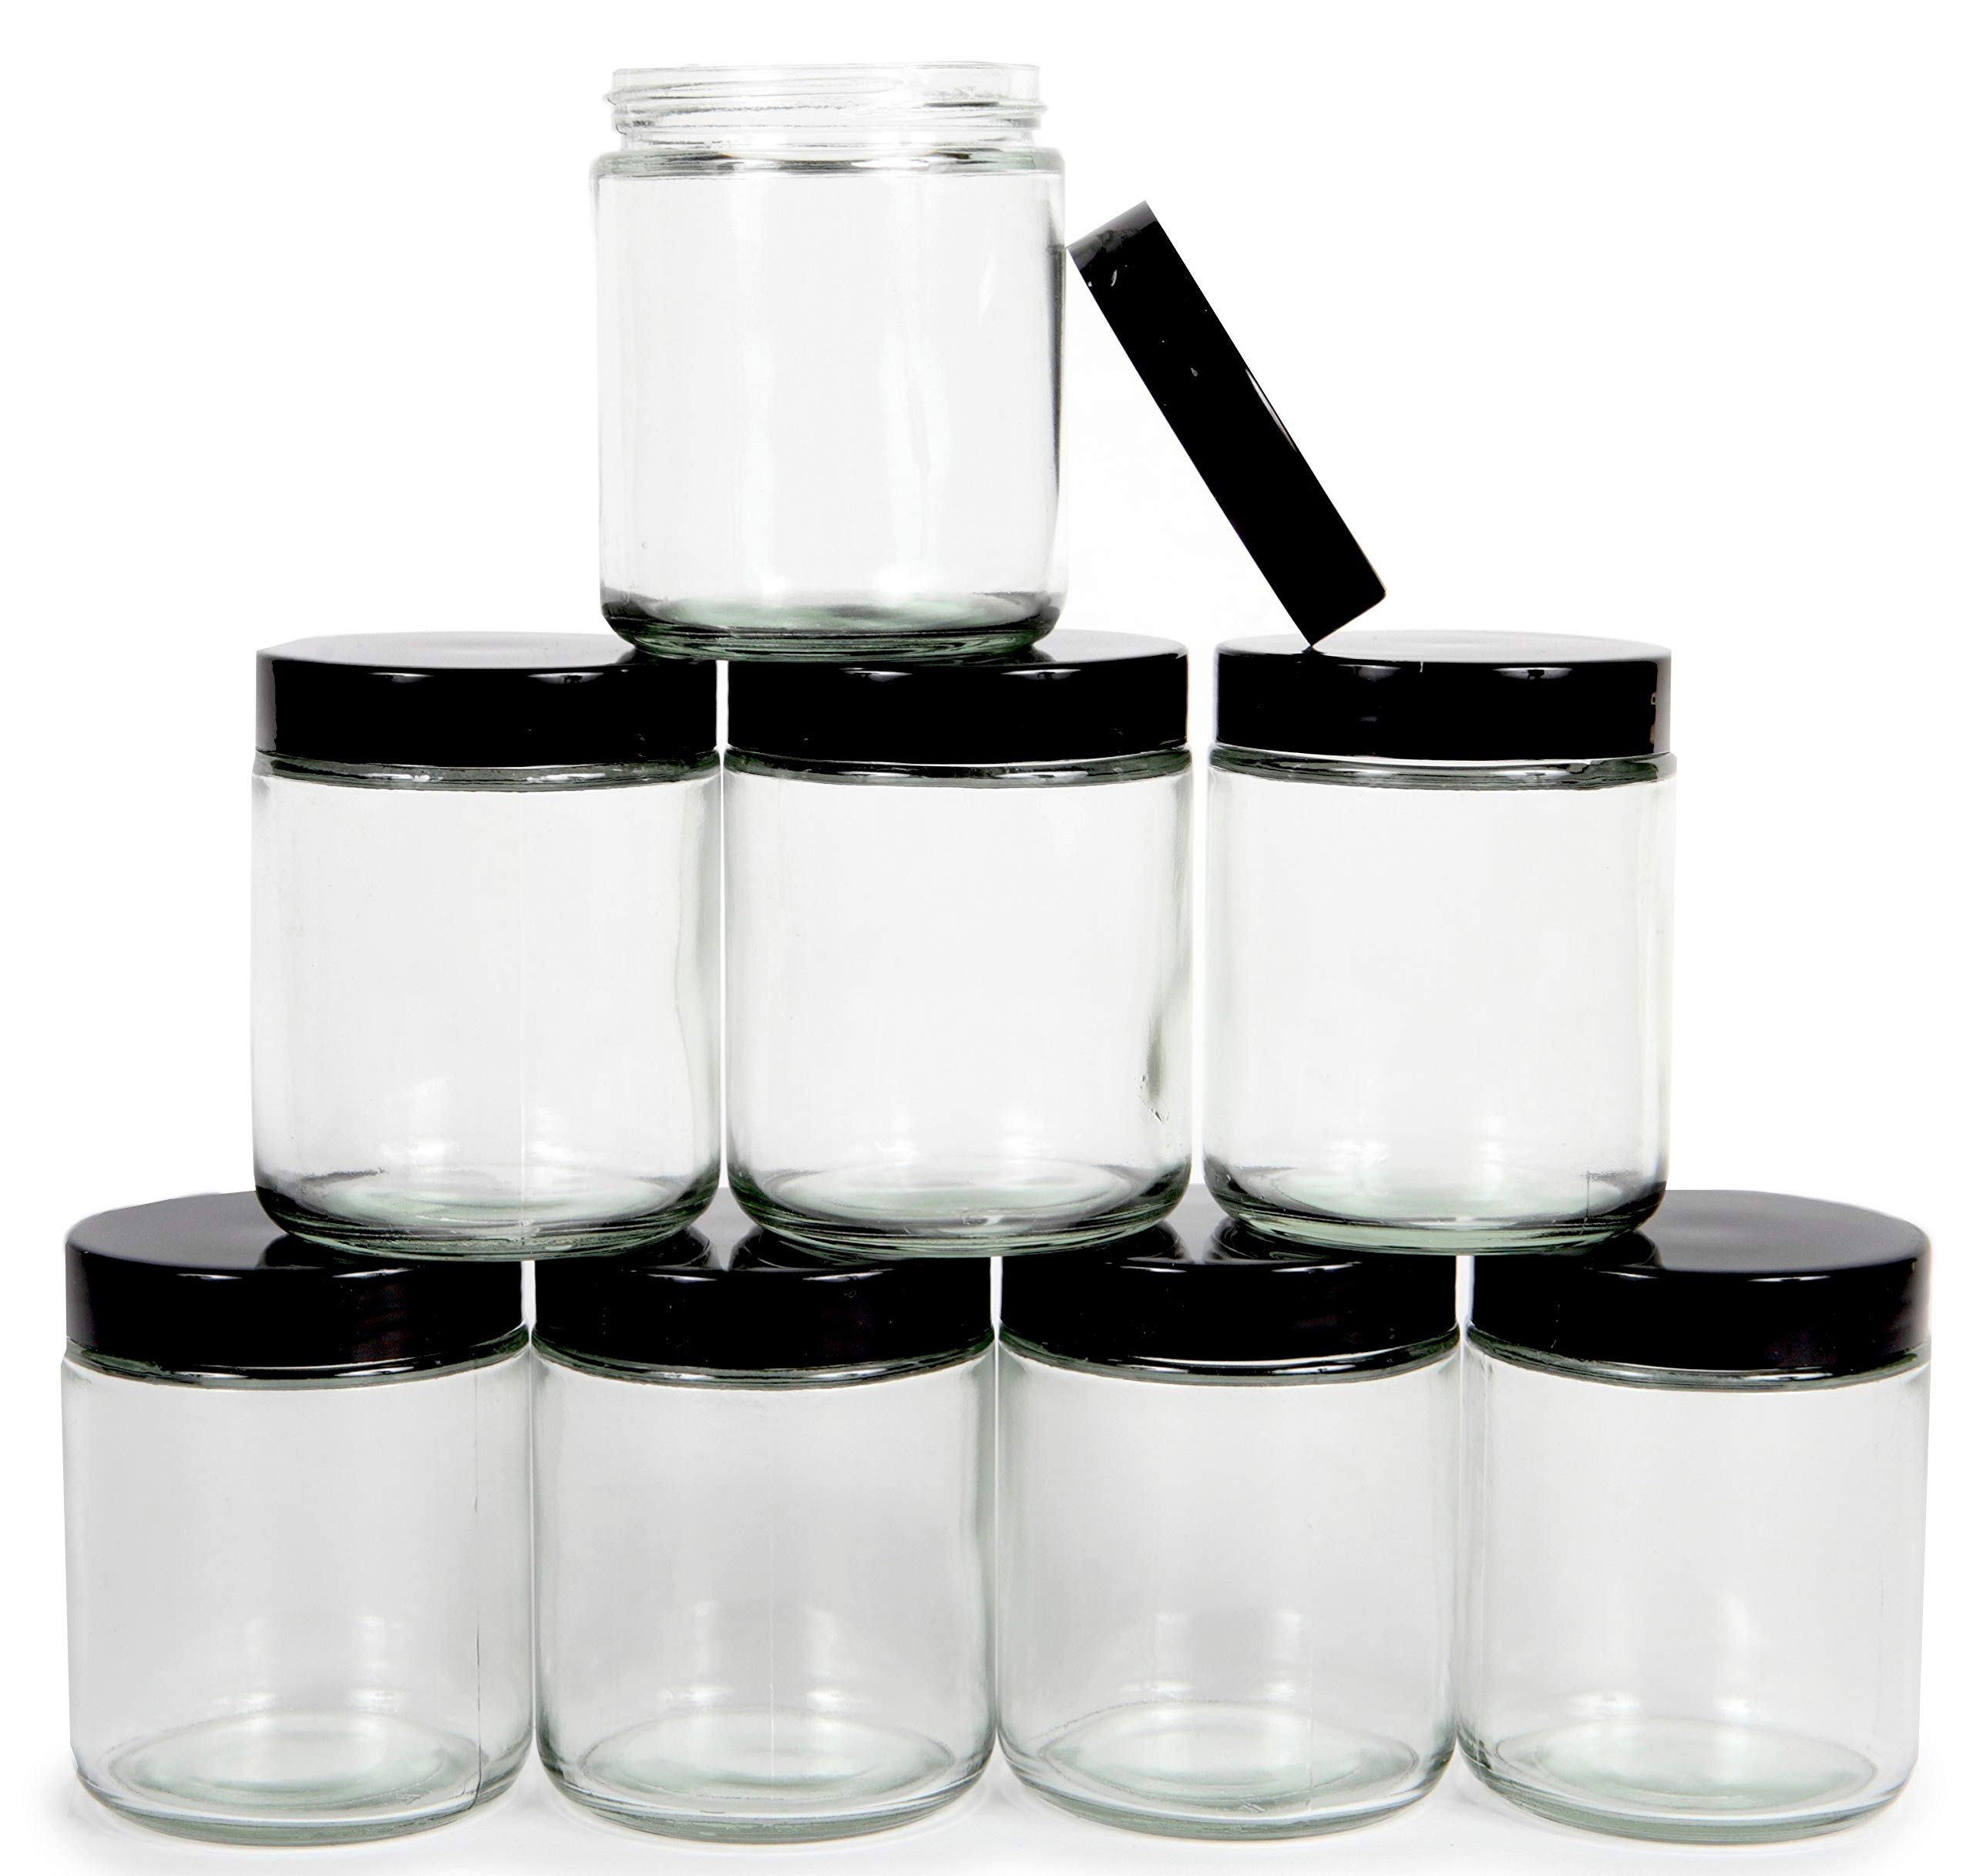 Vivaplex, Clear, 8 ounce, Round Glass Jars, with Black Lids - 8 pack